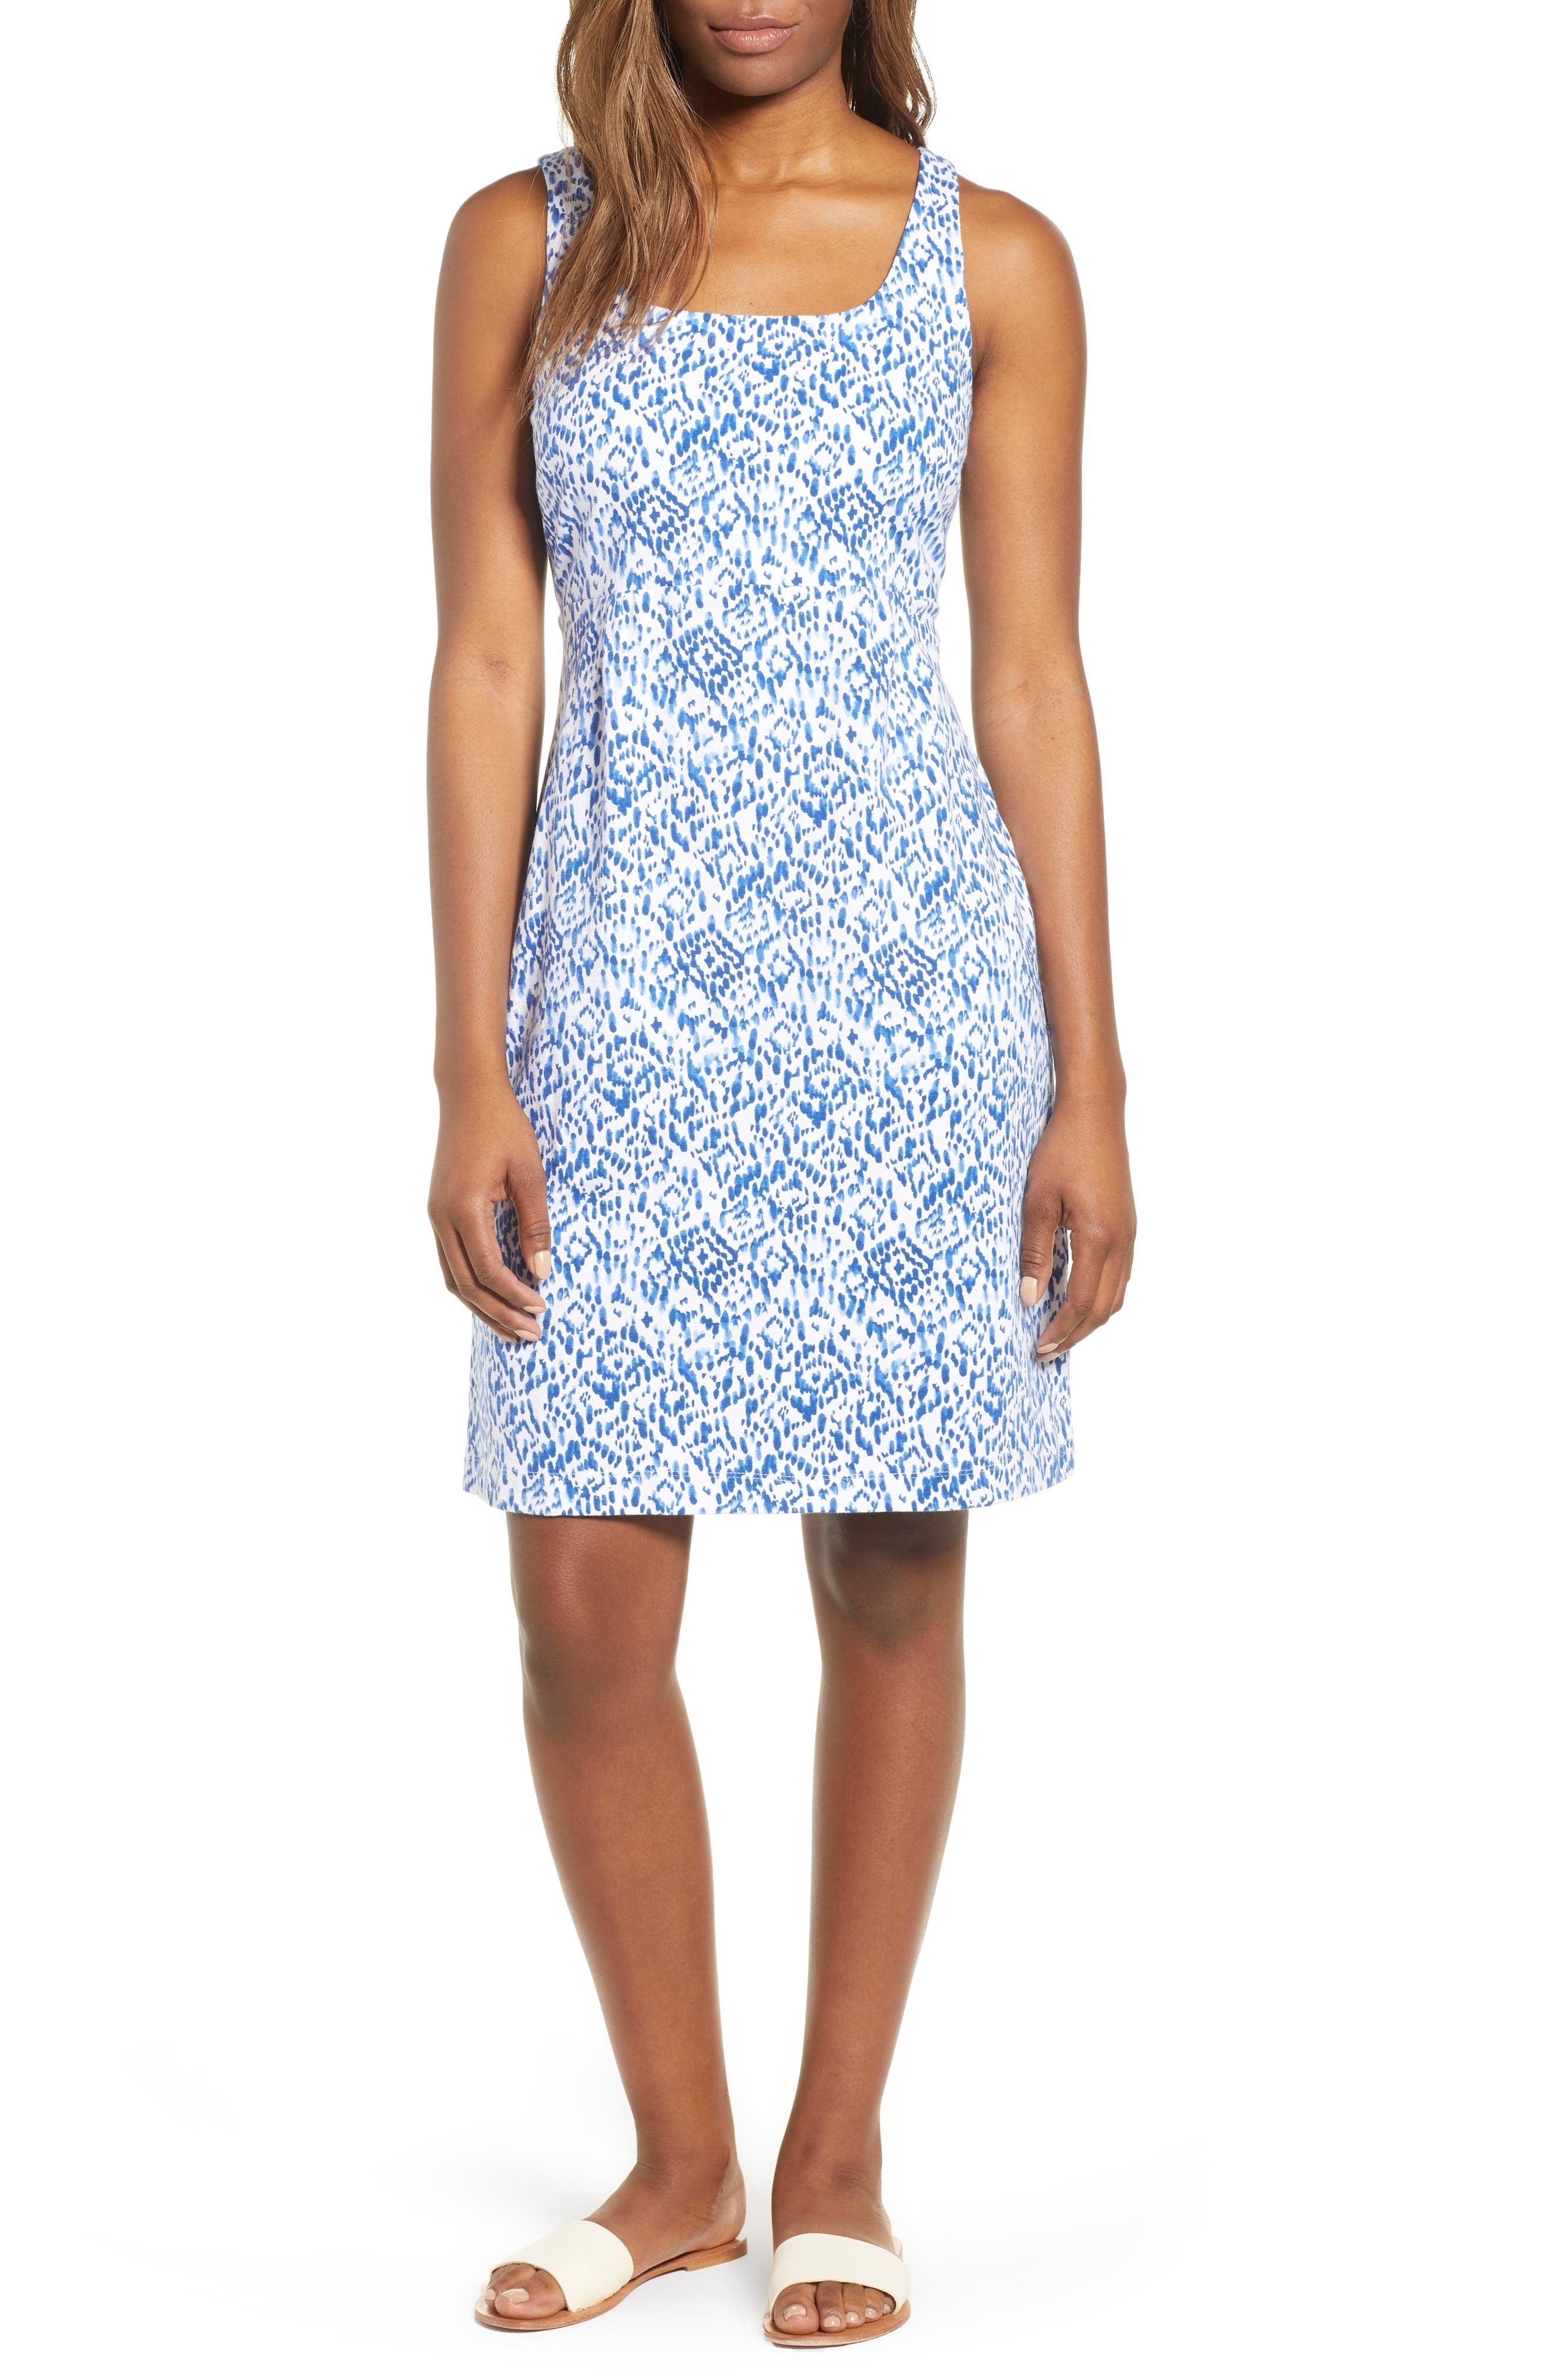 La Liorena Sleeveless Stretch Cotton Tank Dress,                             Main thumbnail 1, color,                             Palace Blue